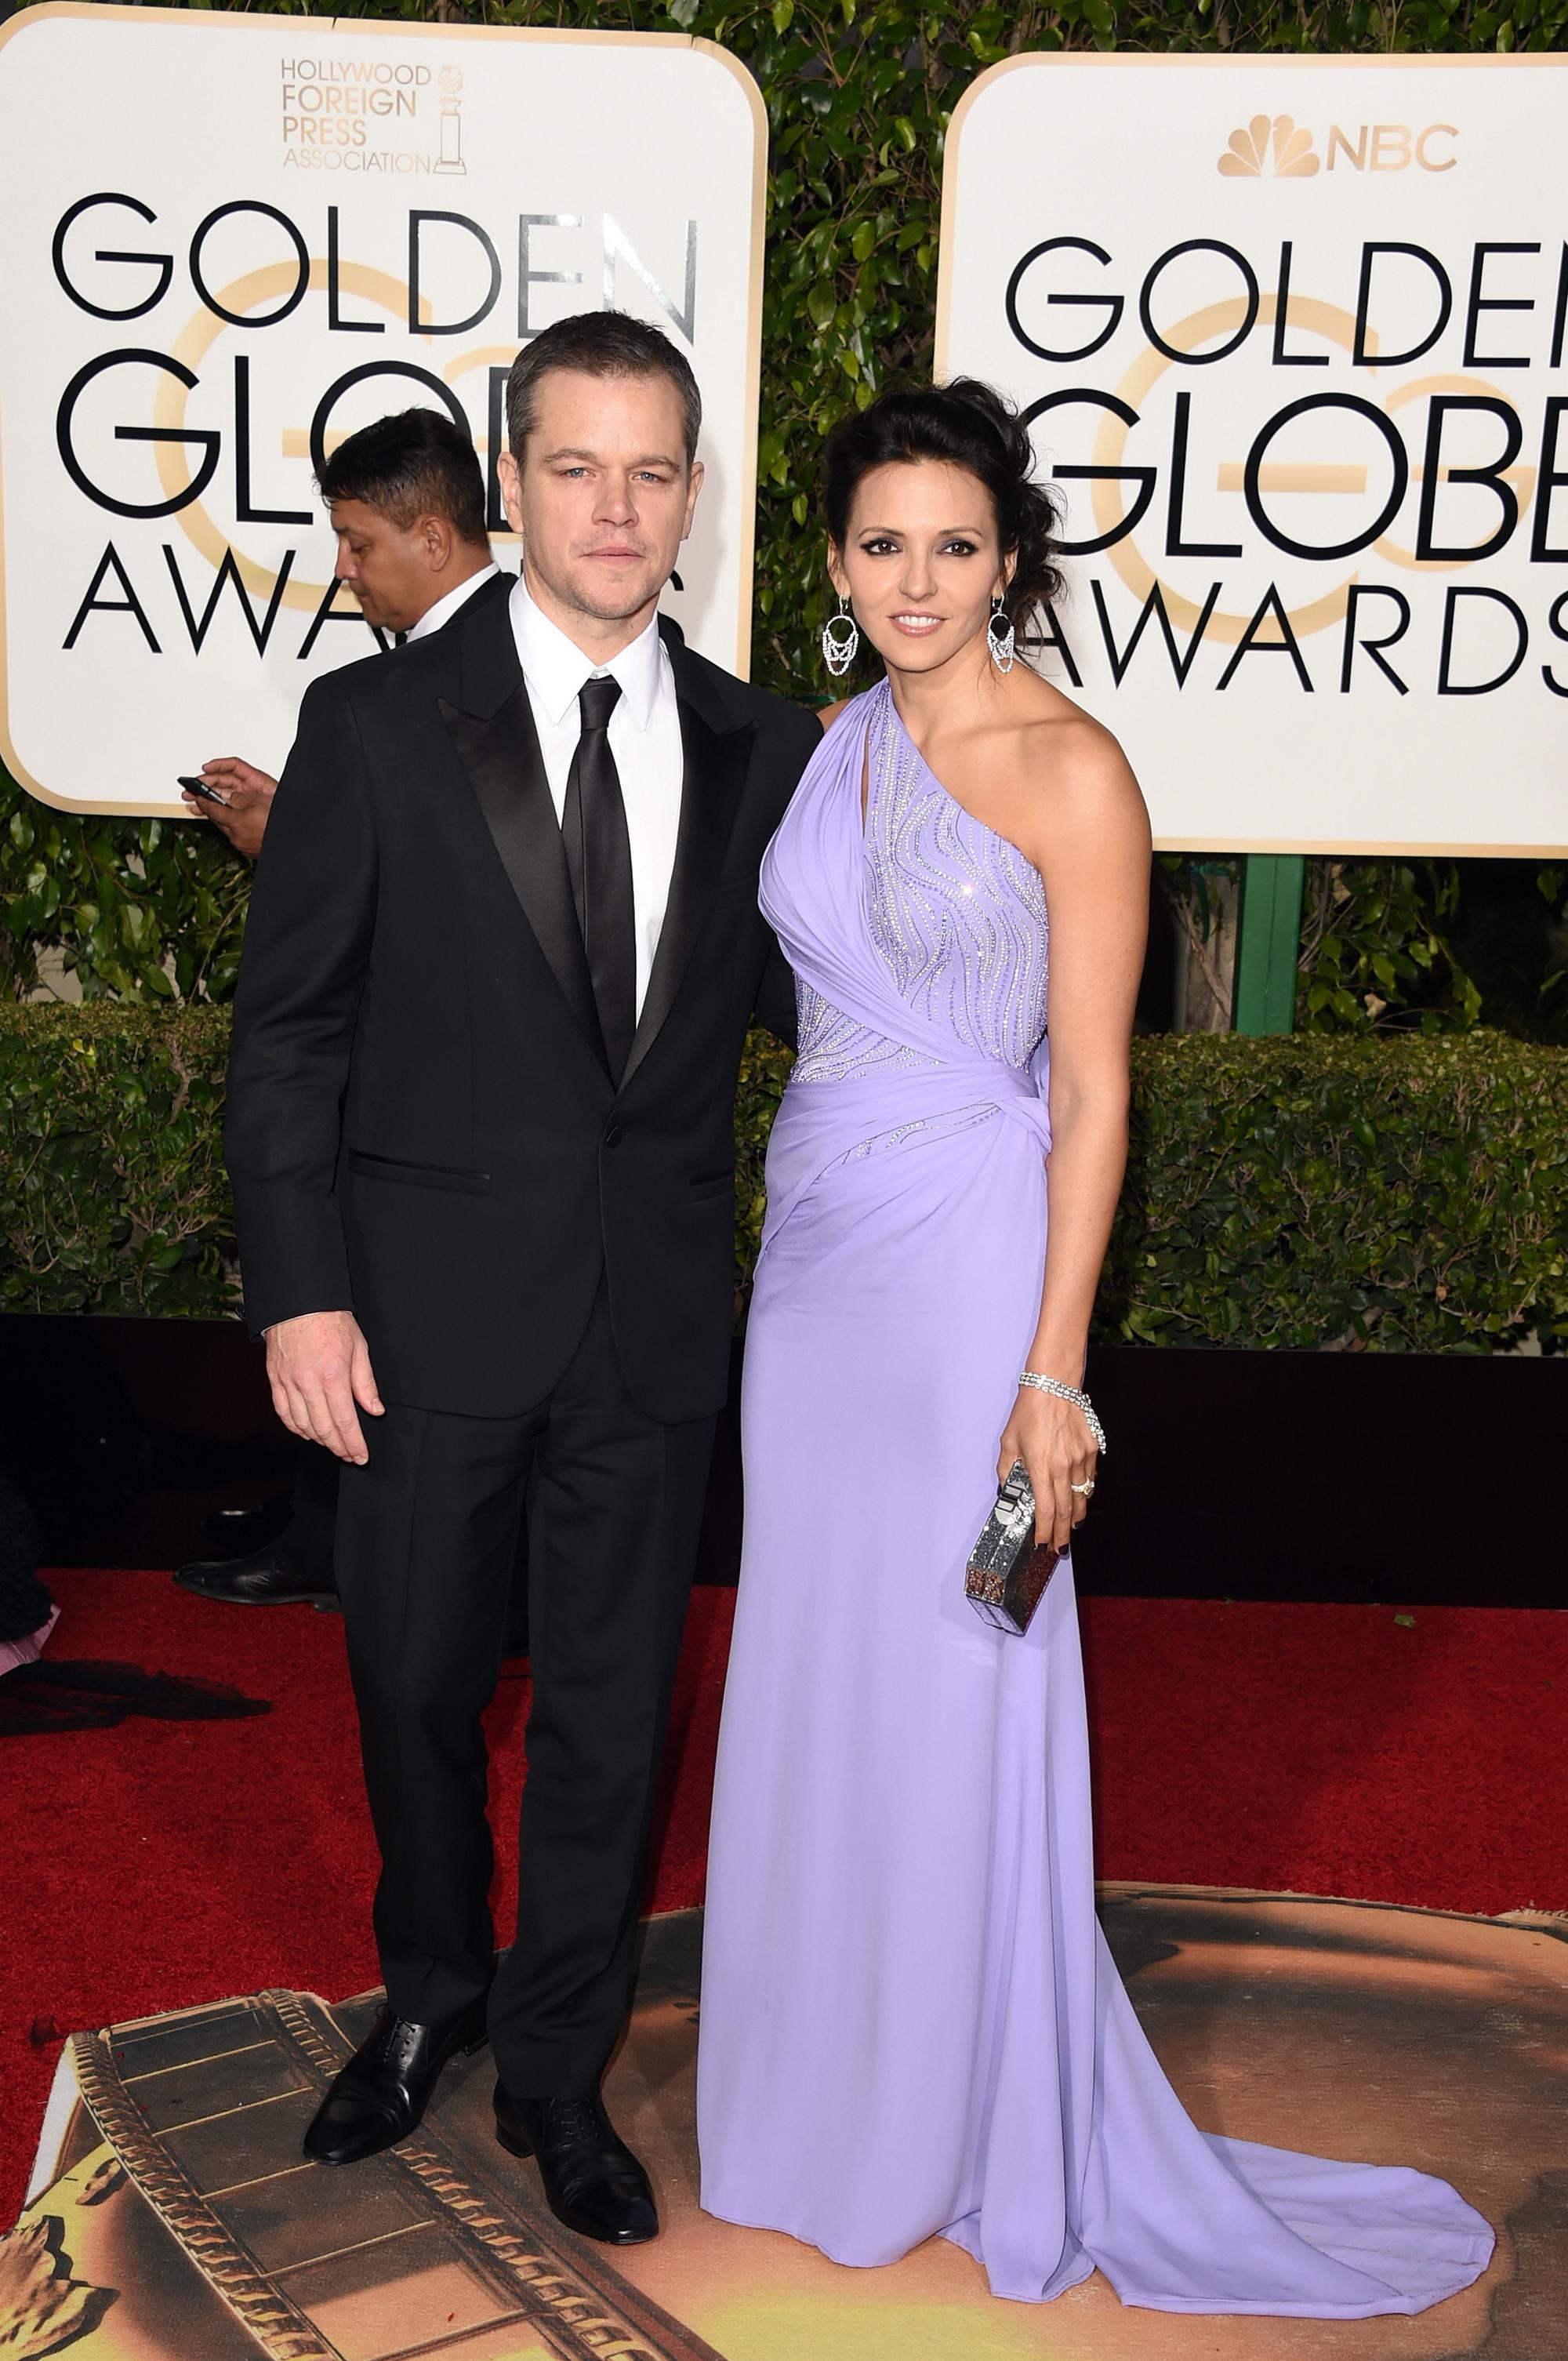 Matt Damon at Annual Golden Globe Awards